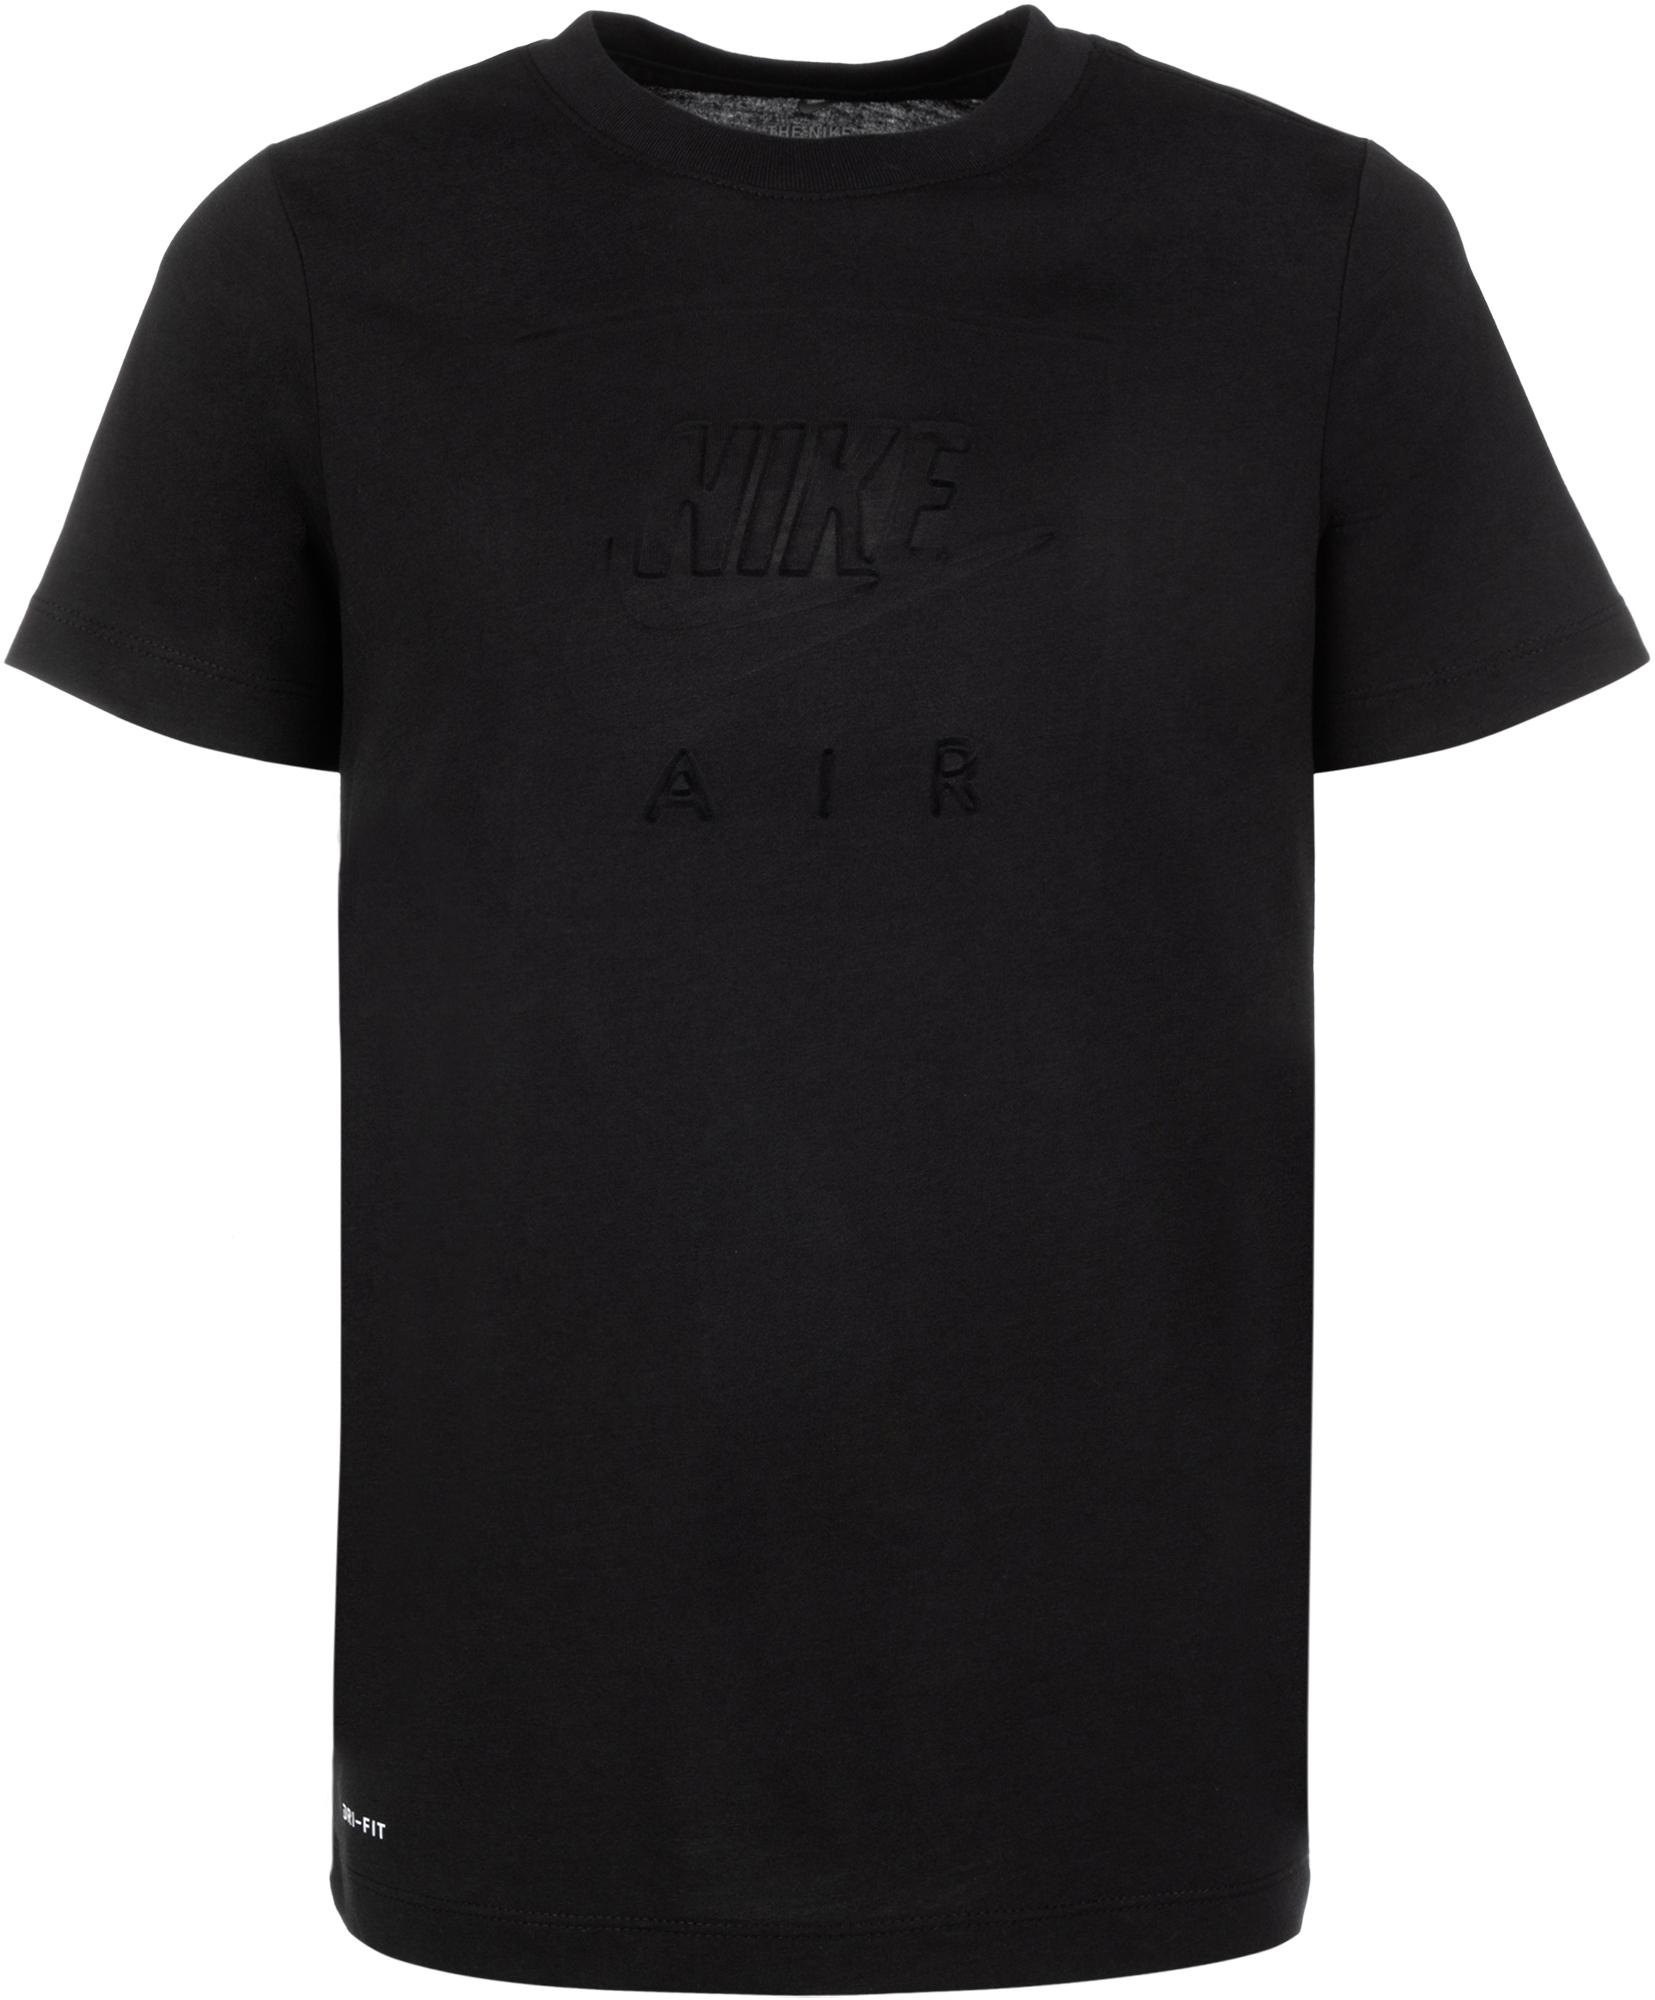 Nike Футболка для мальчиков Nike Dry Air Logo, размер 158-170 цены онлайн